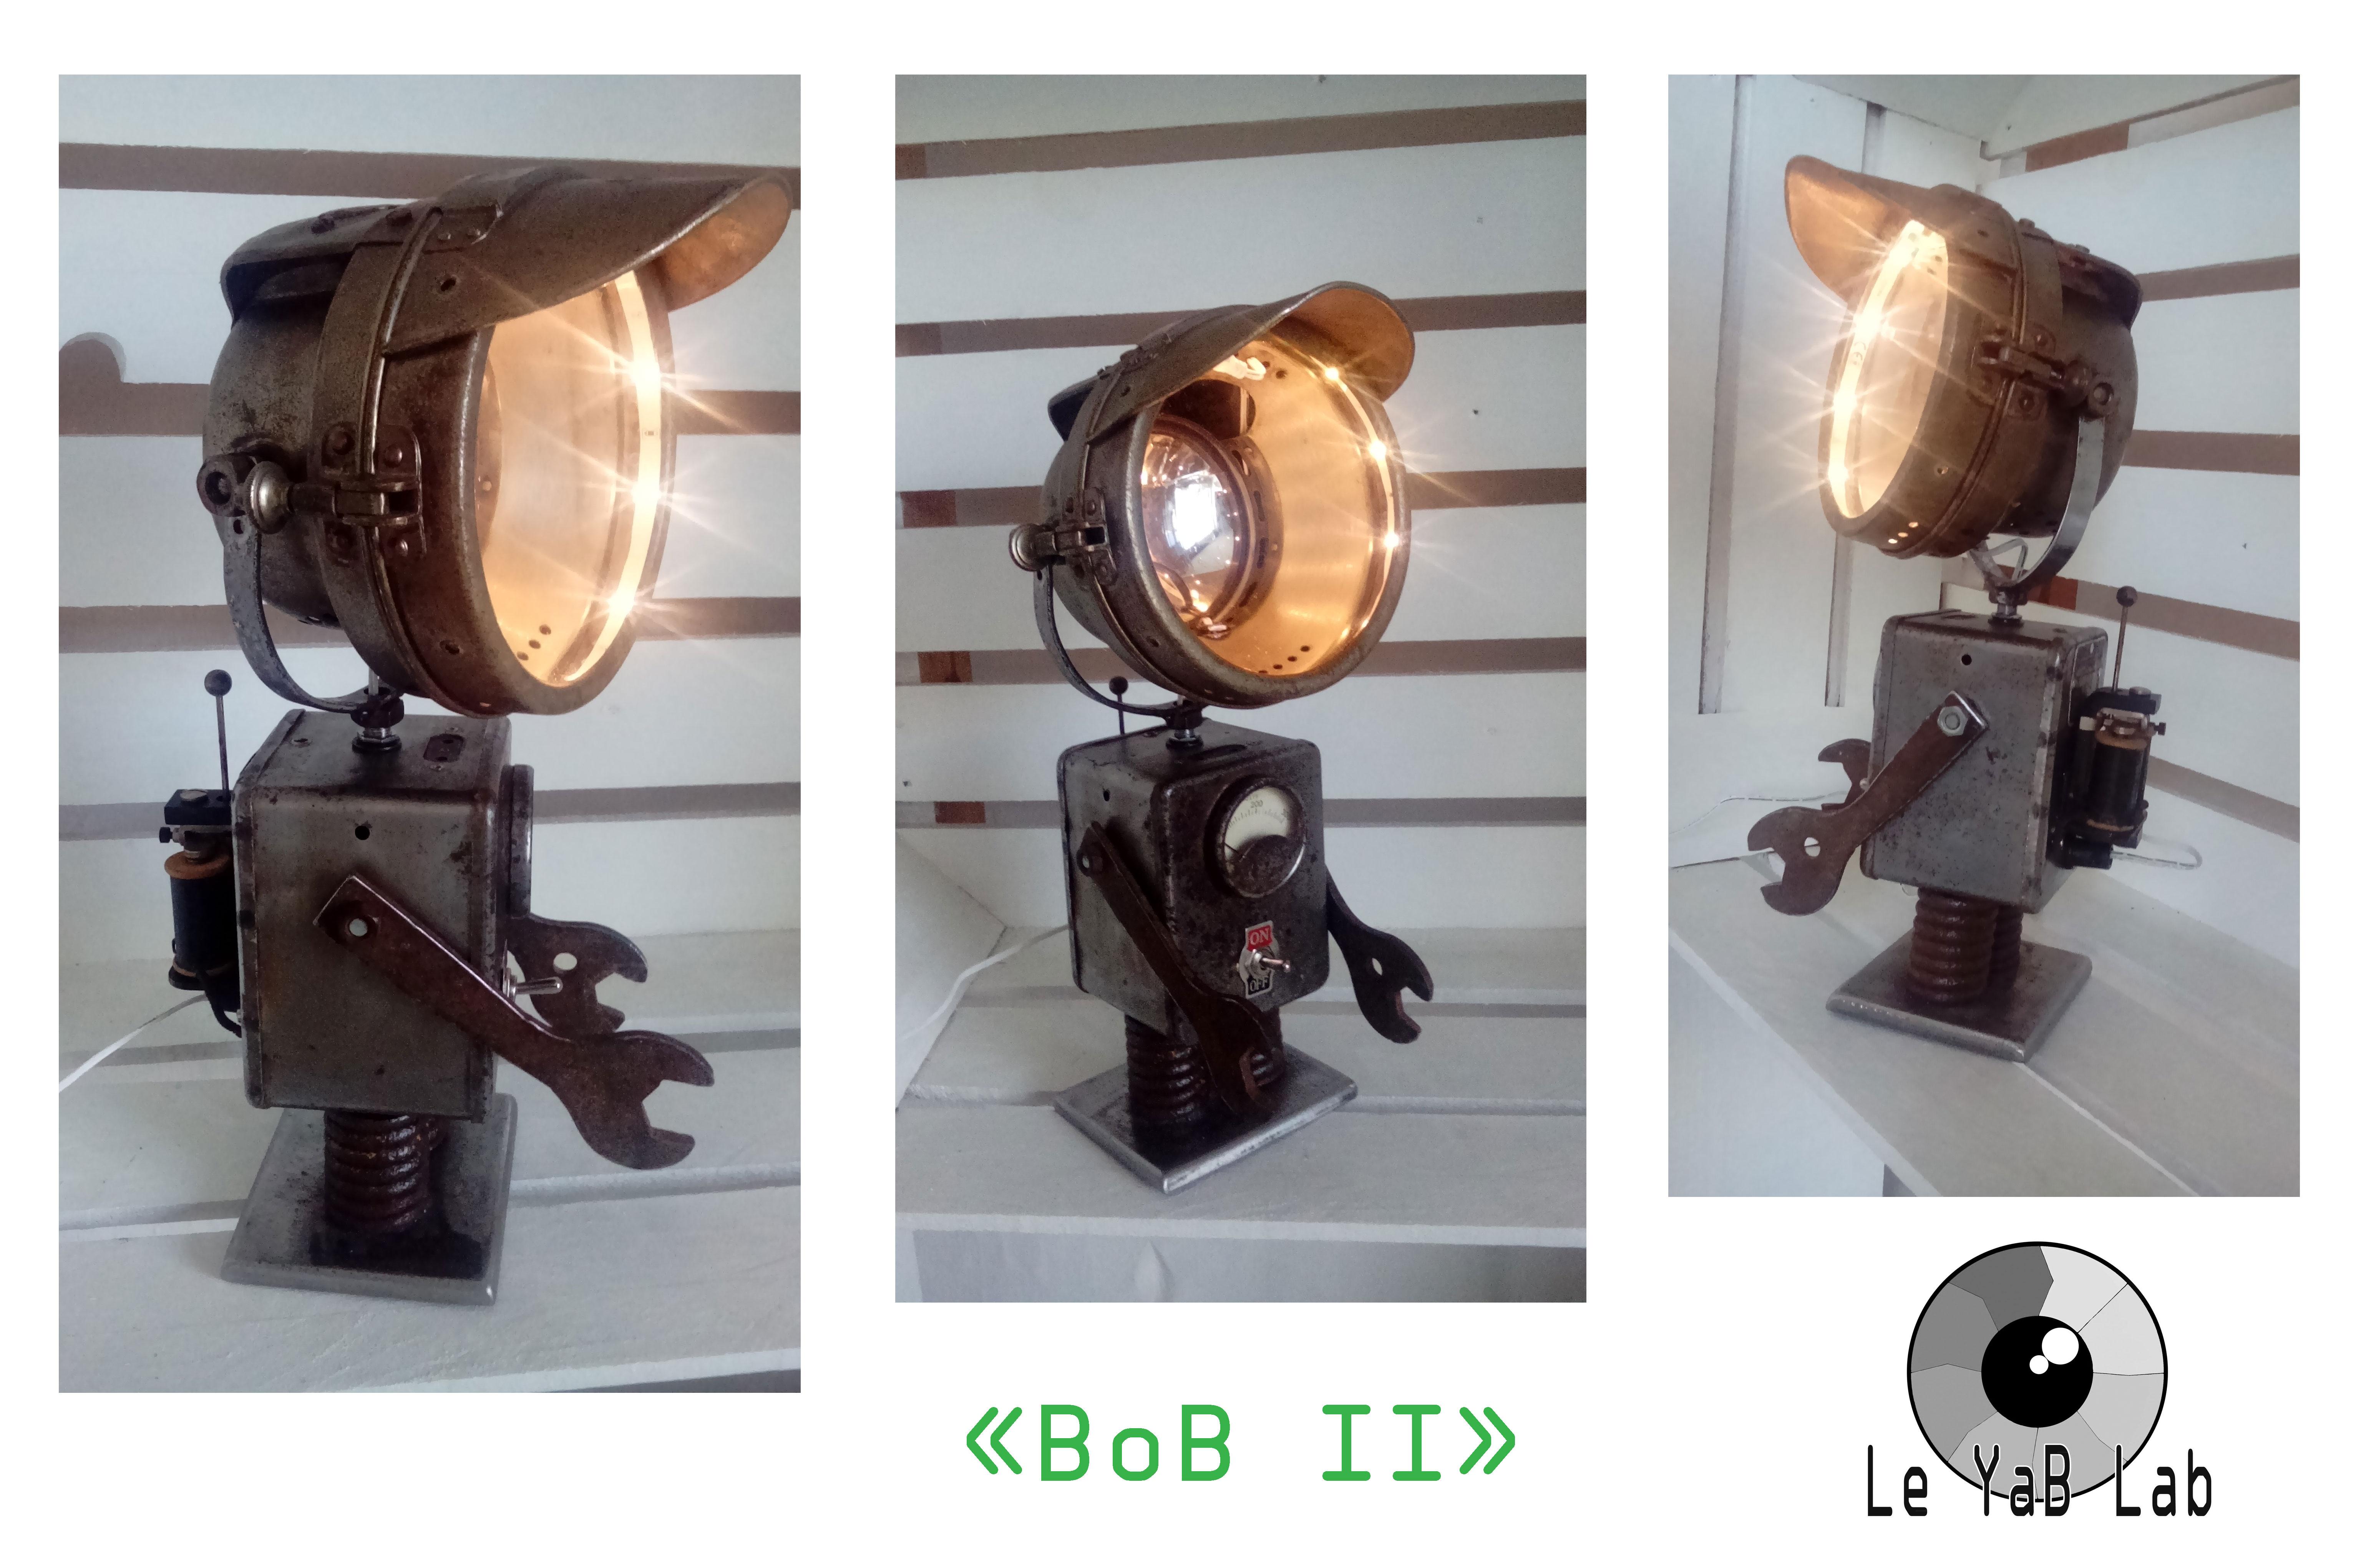 BoB-II